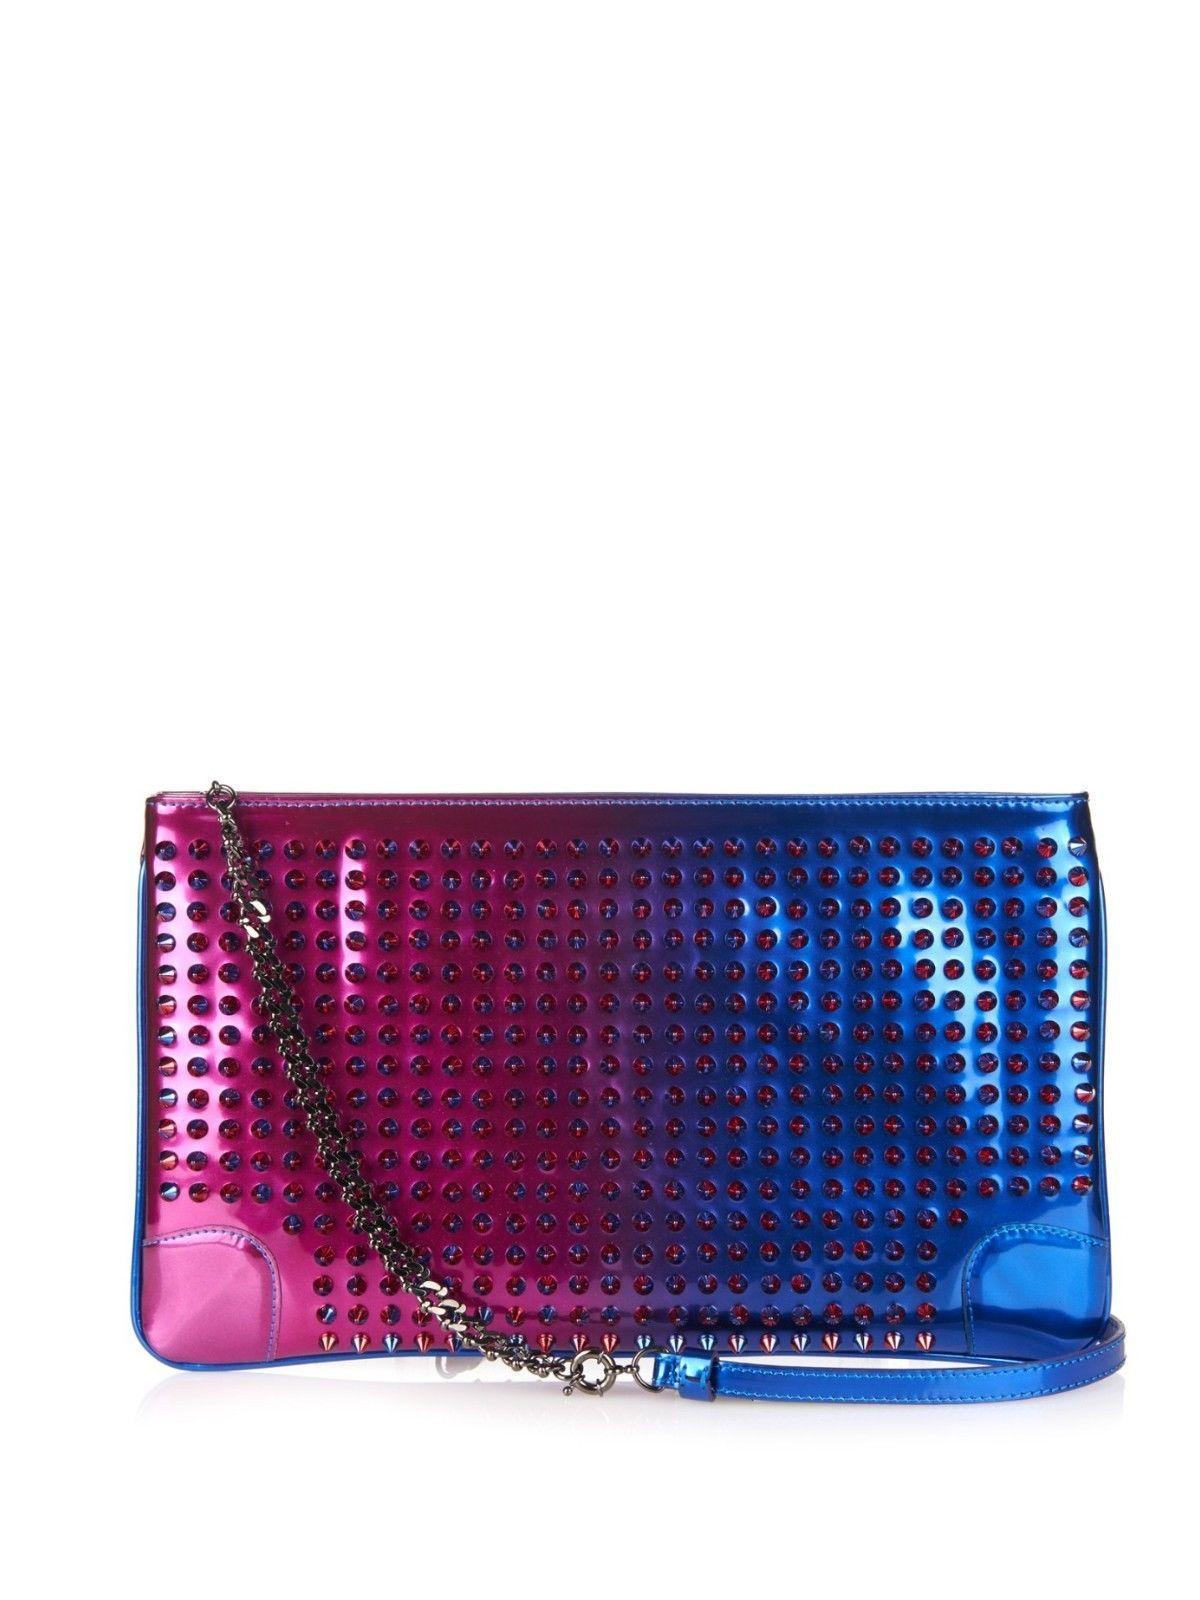 44e5ea94b093 Christian Louboutin Loubiposh Blue   Pink Cross Body Bag Clutch  720.0.  Metallic HandbagsPurple HandbagsLeather ...